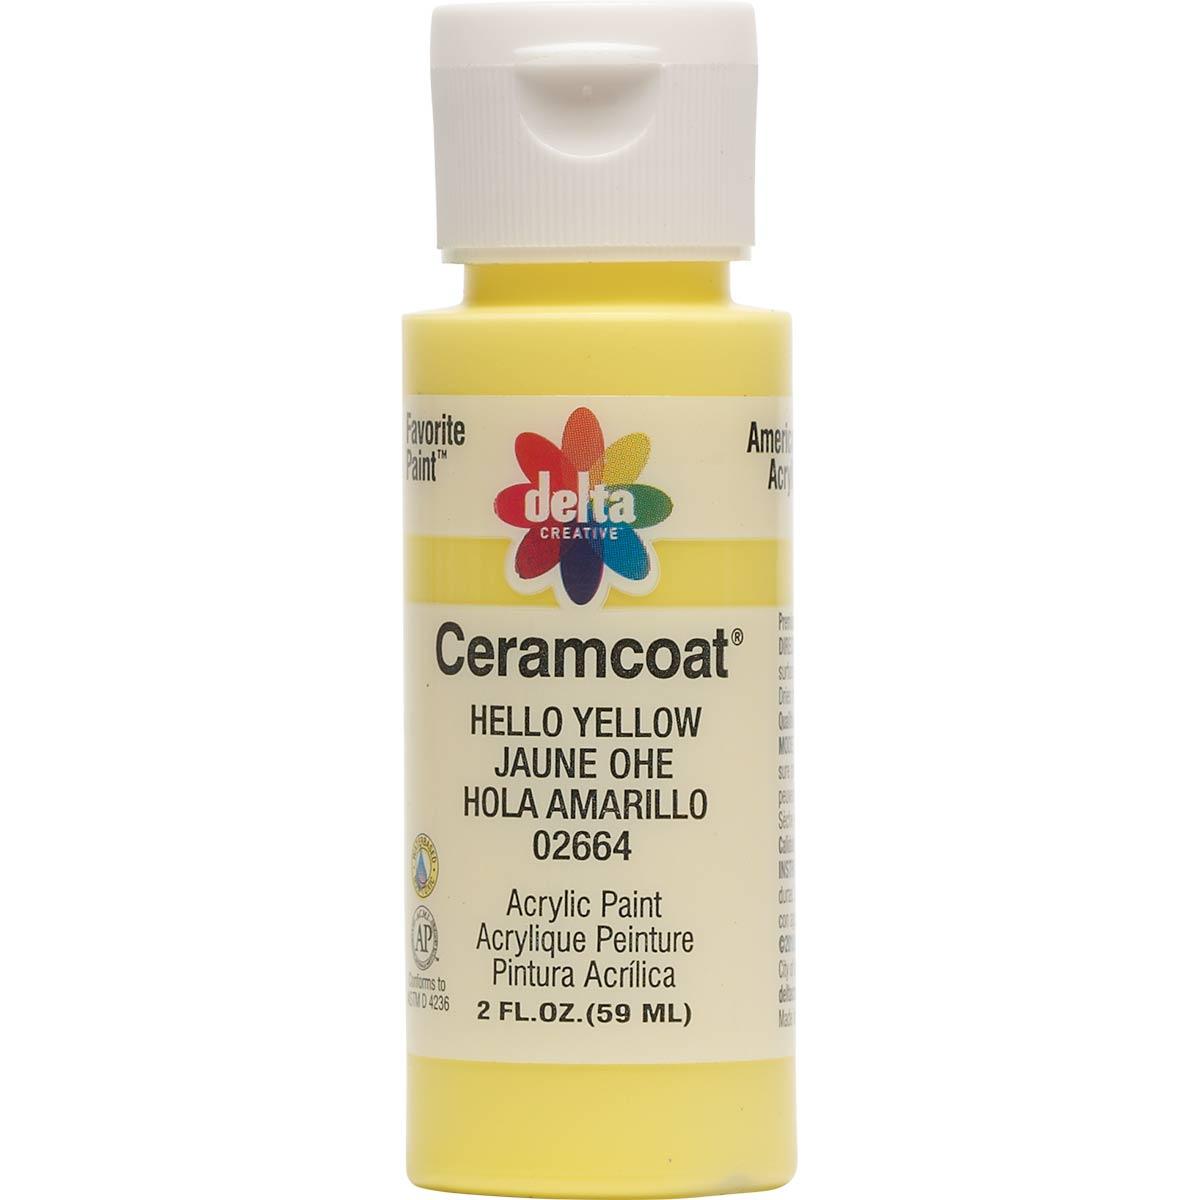 Delta Ceramcoat ® Acrylic Paint - Hello Yellow, 2 oz. - 026640202W